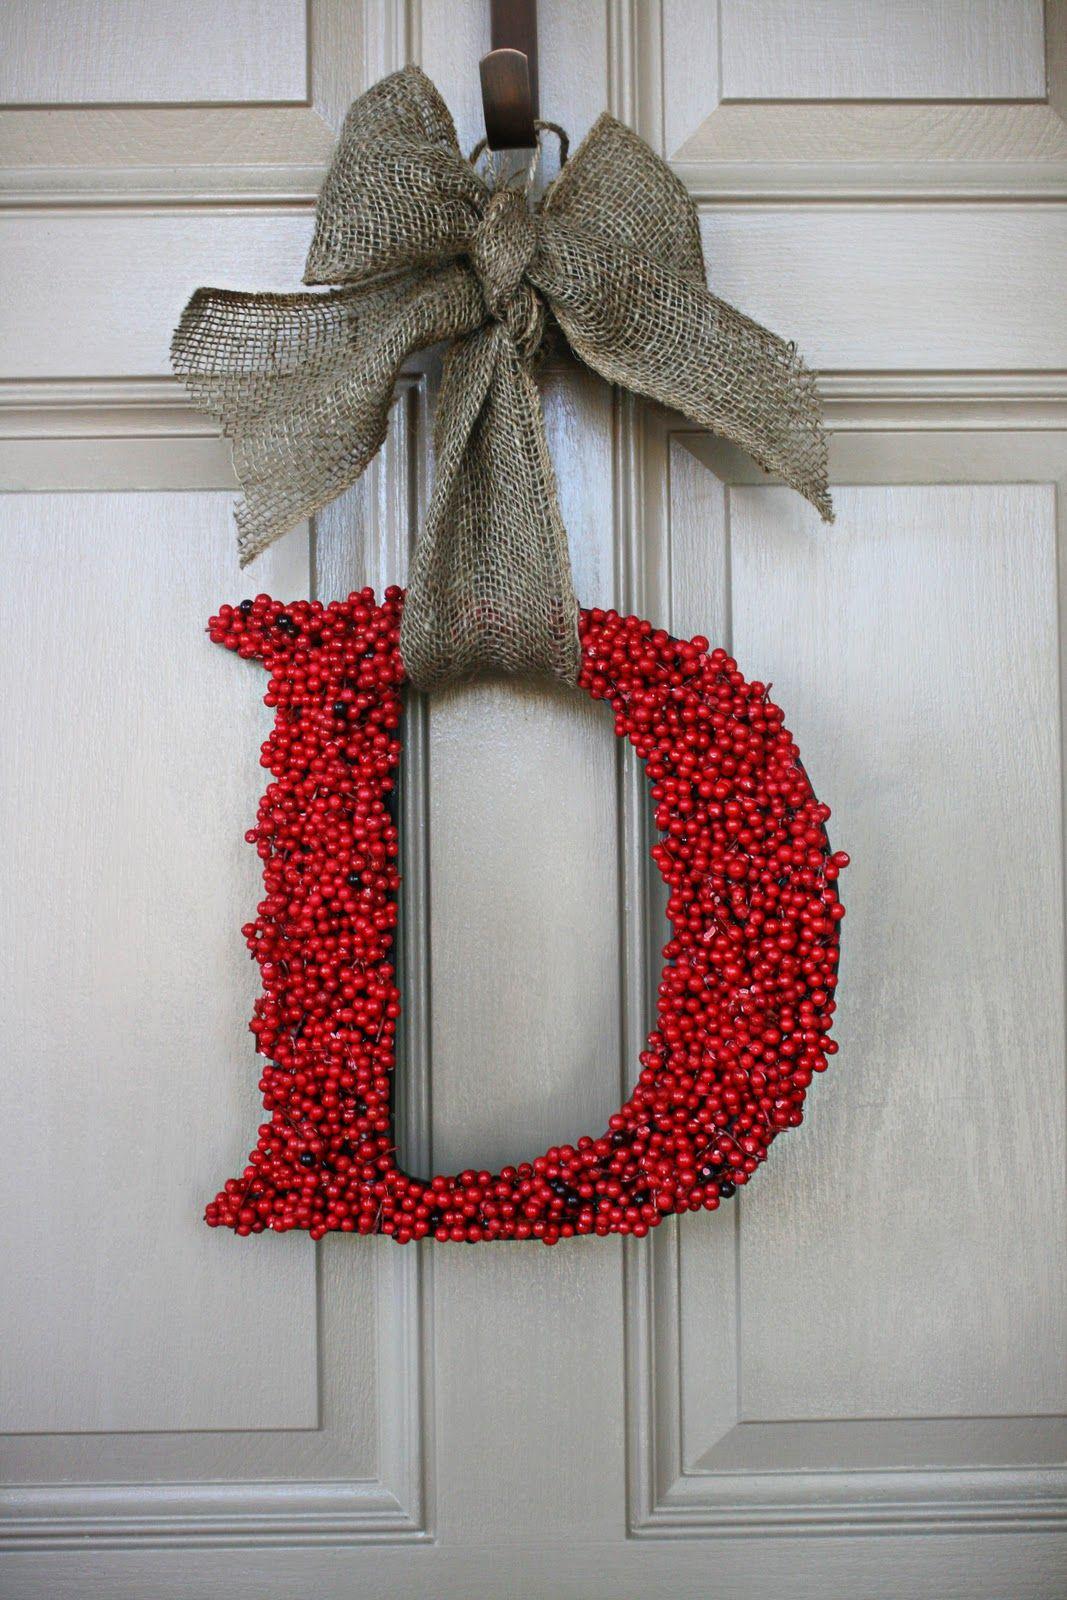 DIY Berry Letter Wreath